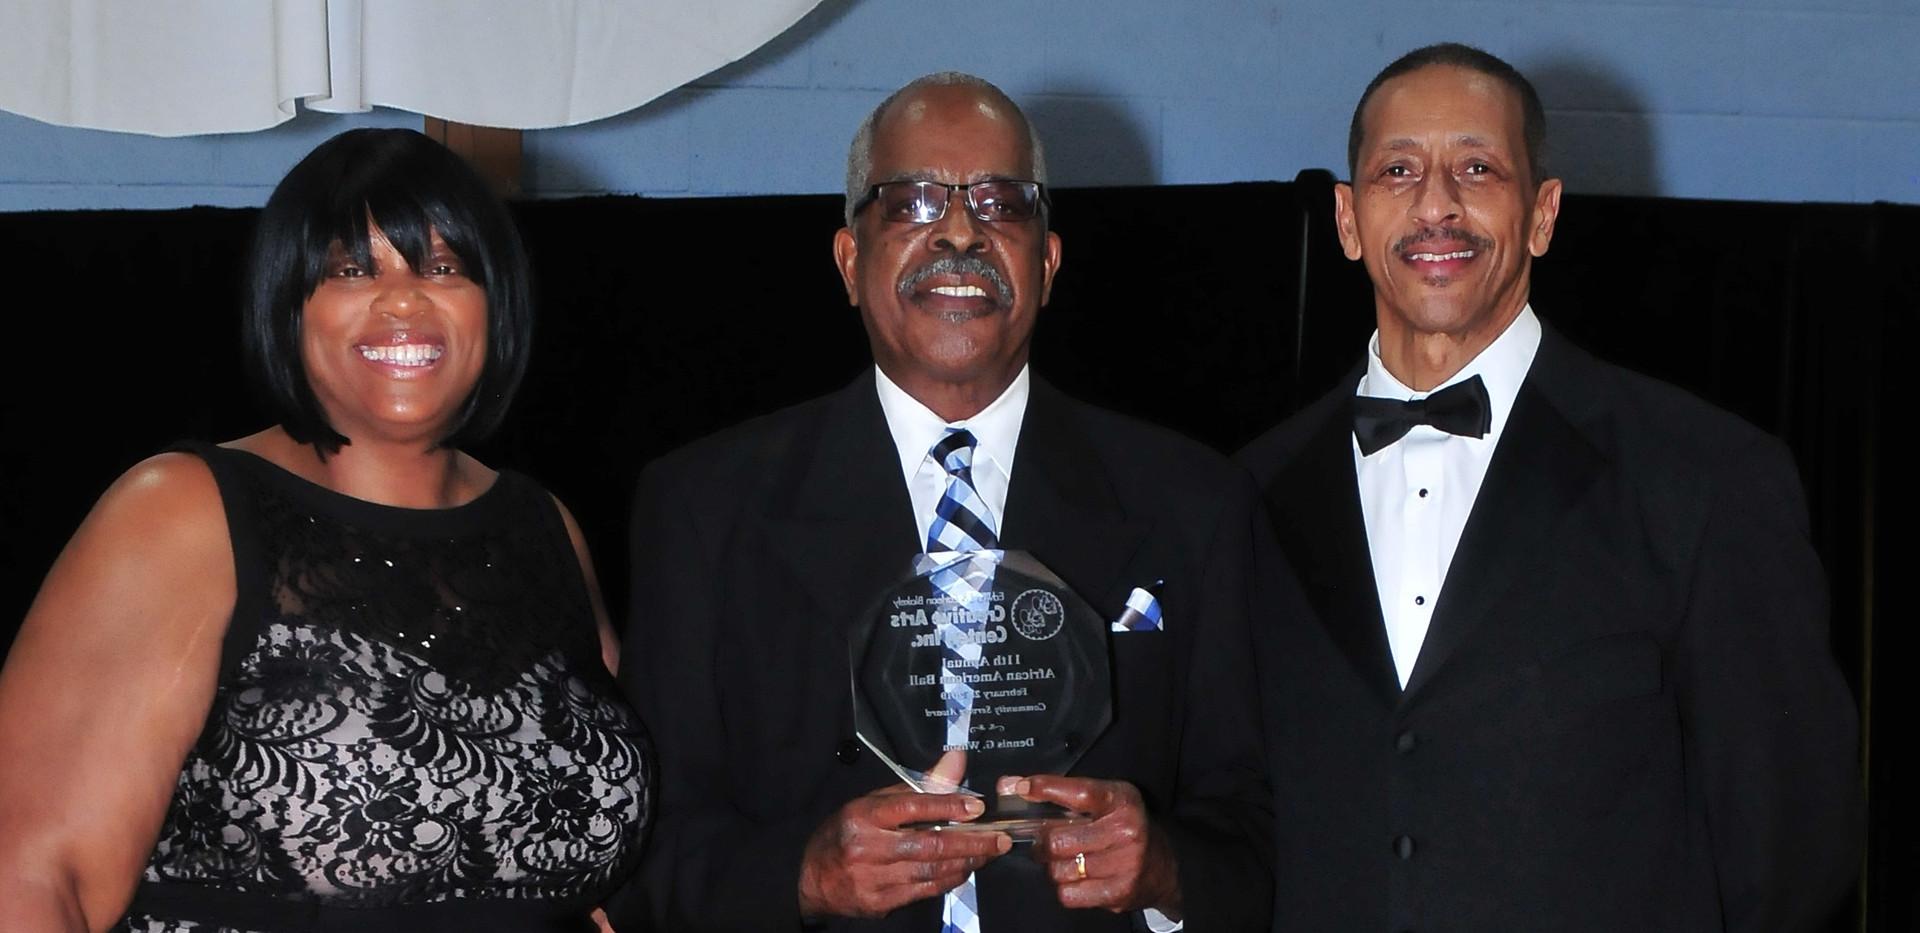 Honoree Dennis G. Wilson